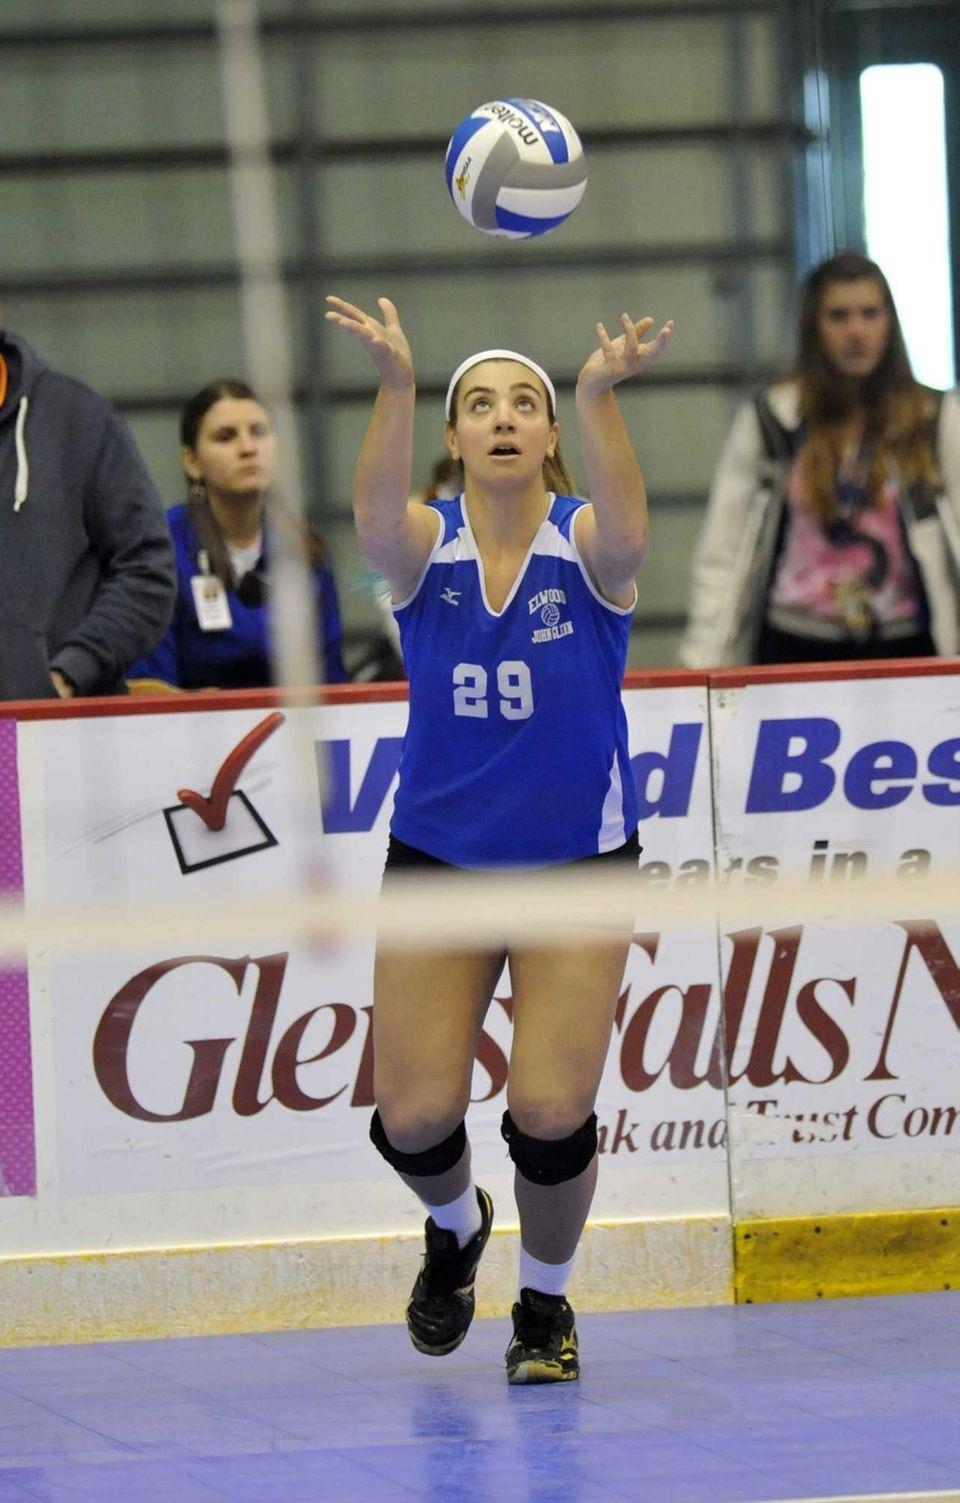 John Glenn's Stephanie Viteritti (29) serves the ball